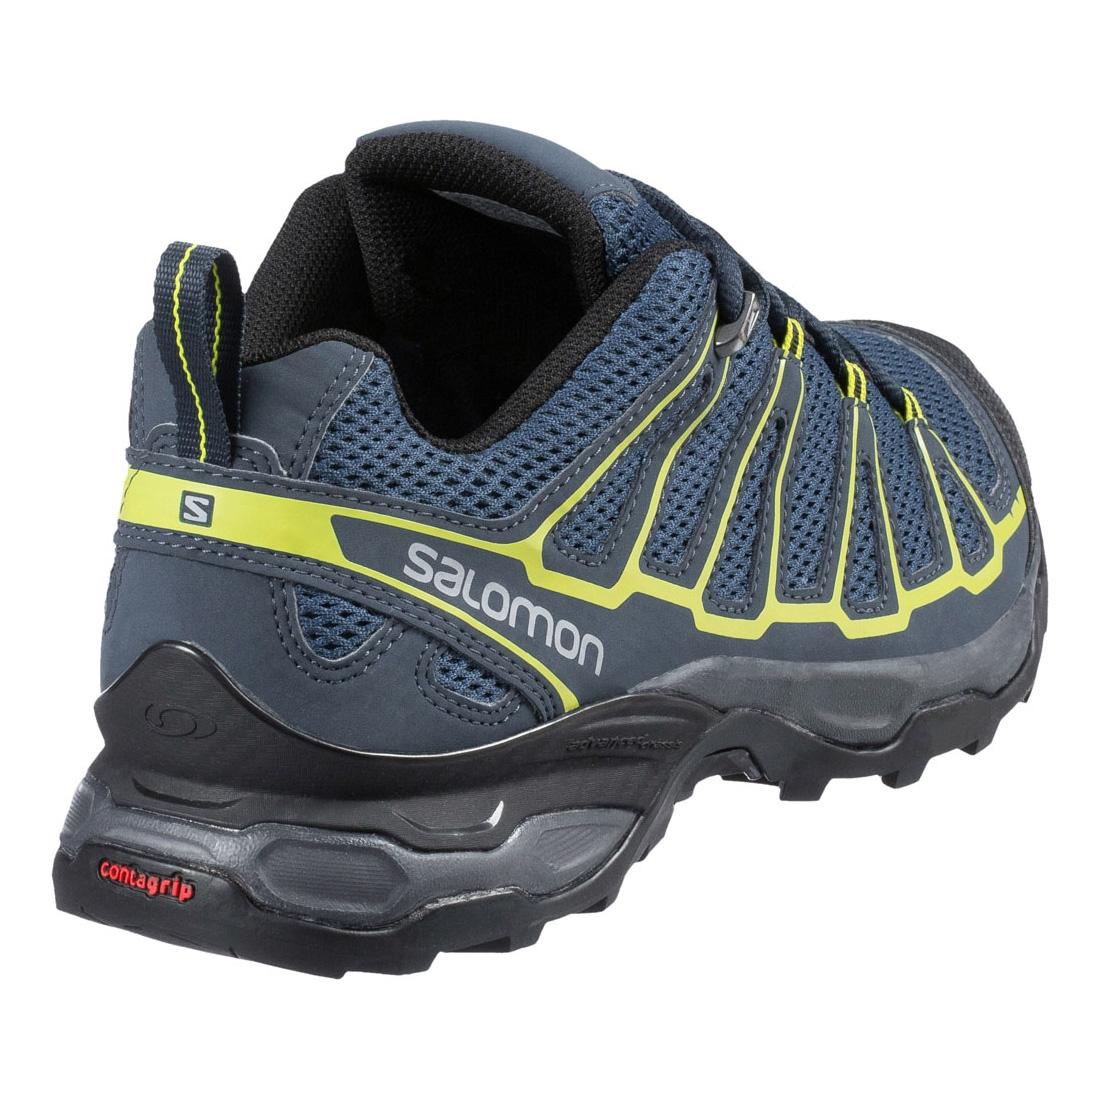 ... Image of Salomon X Ultra Prime Walking Shoes (Men's) - Fjord / Deep Blue  ...